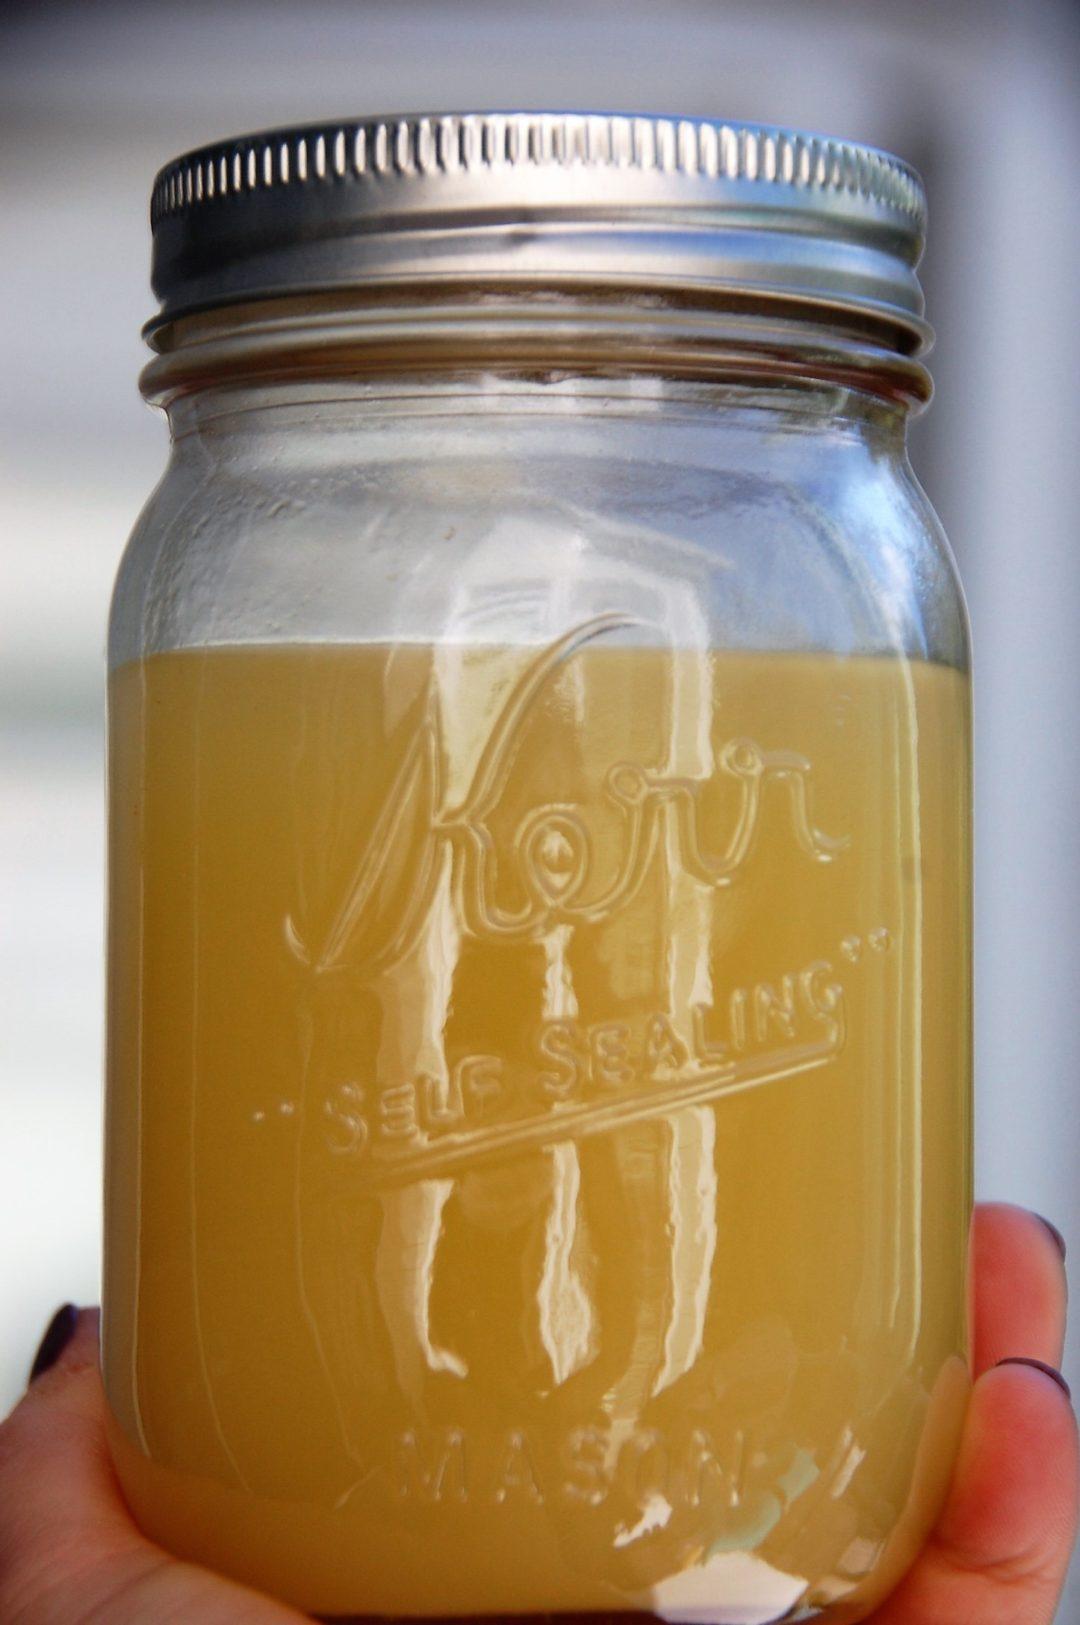 healthy crockpot chicken stock in a Kerr Mason jar by Crockpot Empire